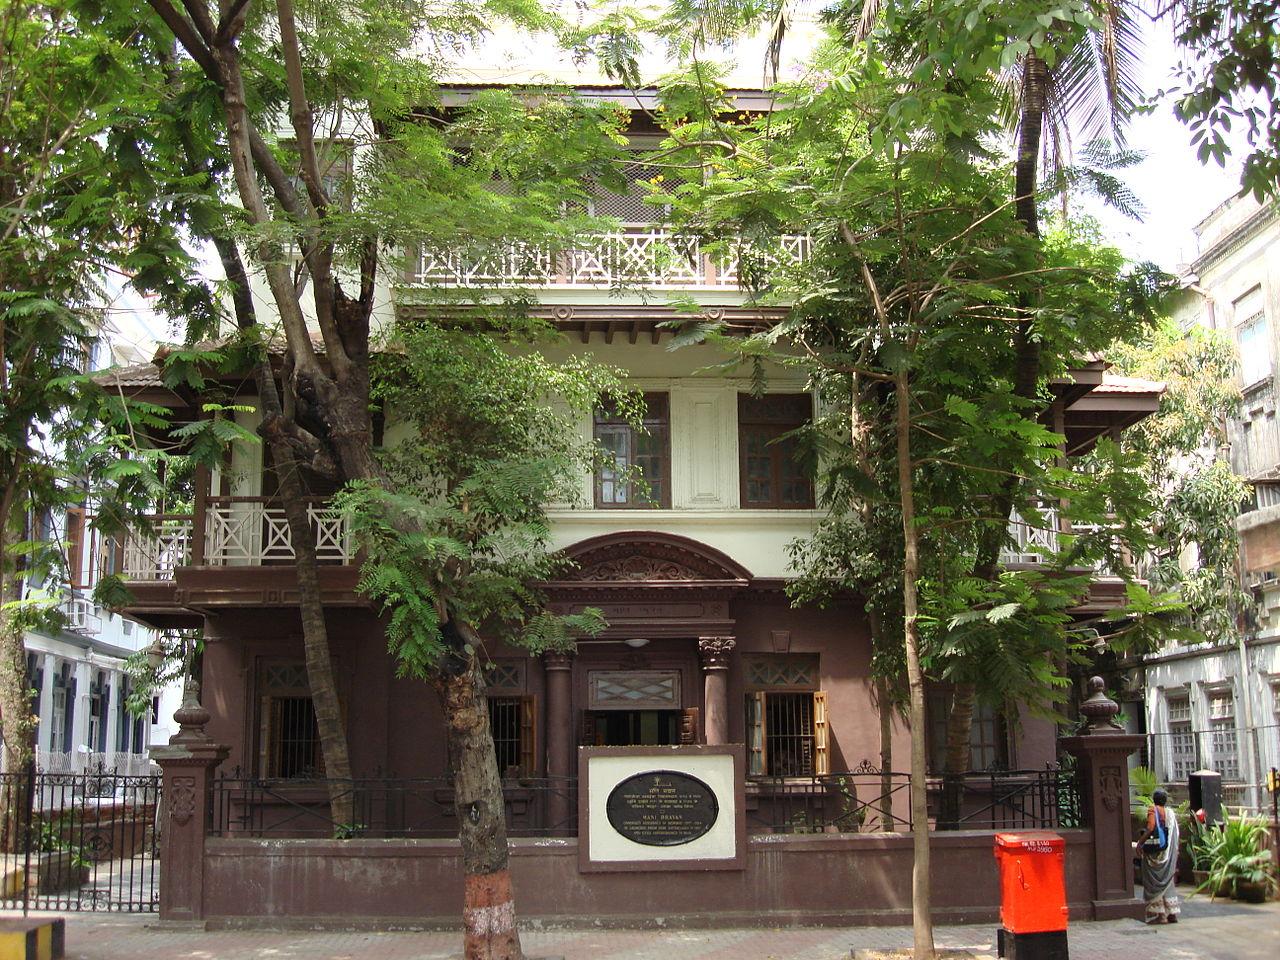 Place To Visit Near Afghan Church-Mani Bhavan, Gandhi's house in Mumbai